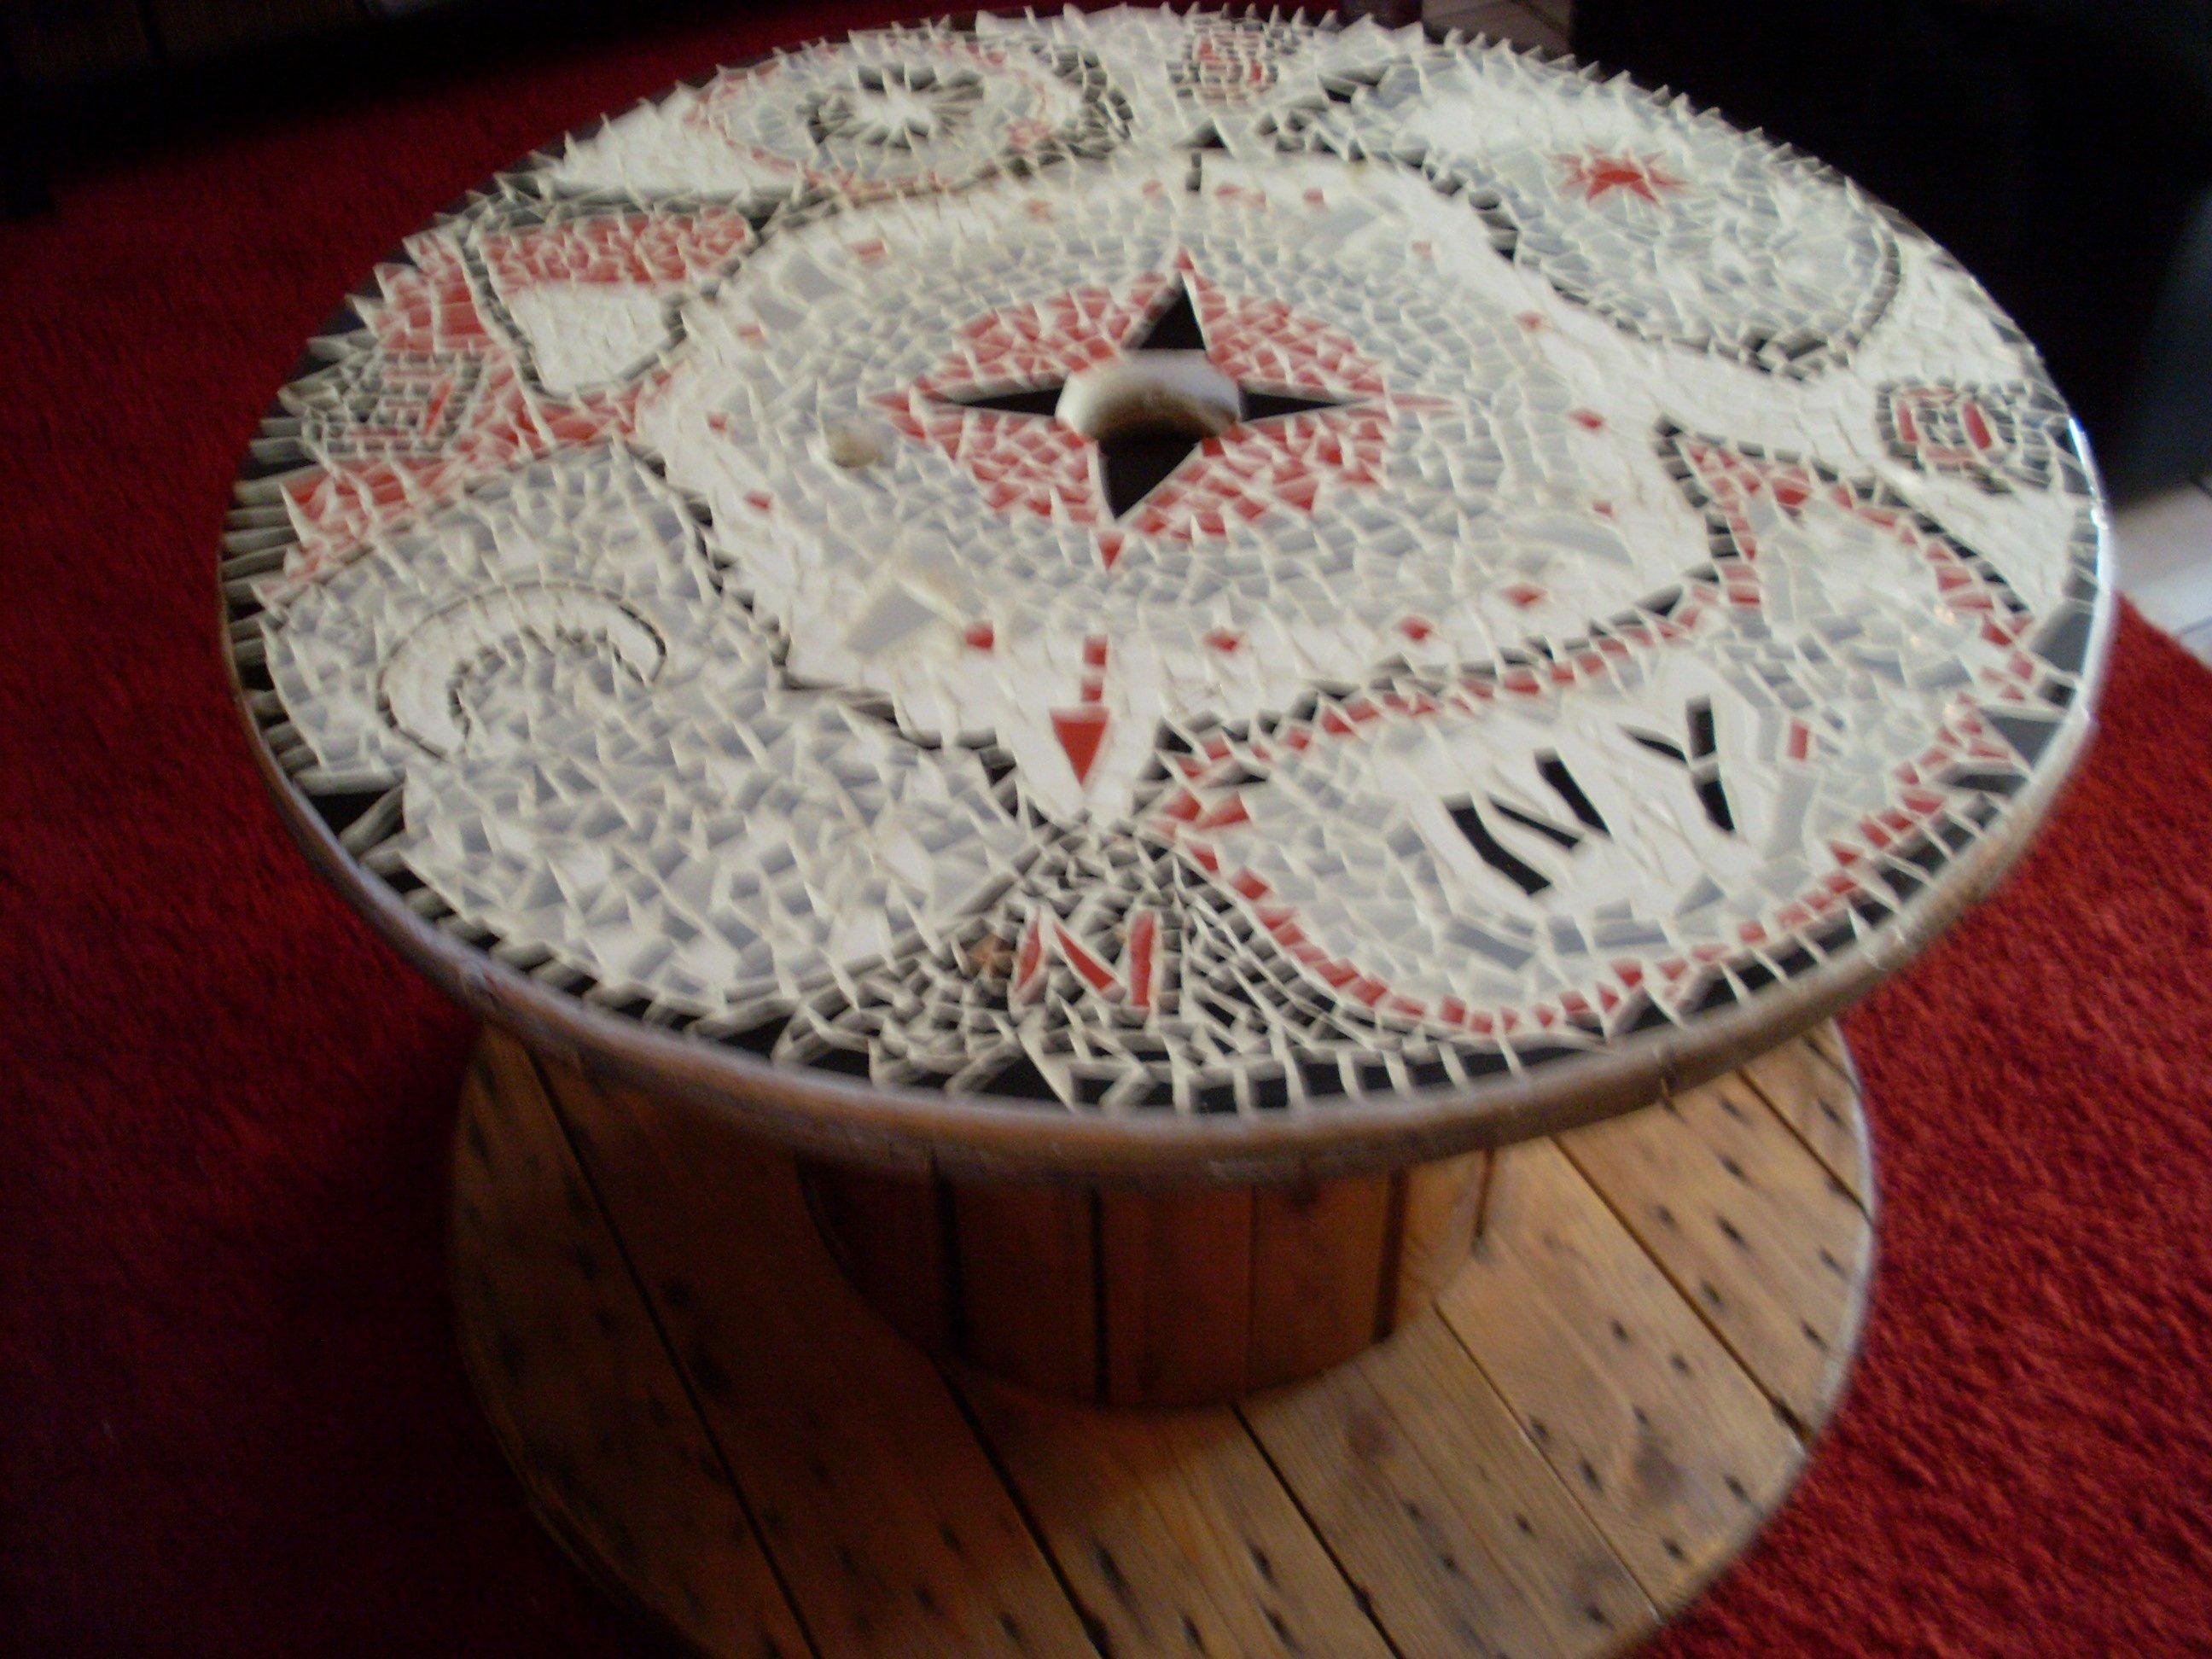 mosa hic62 table de salon originale enfin selon moi hihi. Black Bedroom Furniture Sets. Home Design Ideas